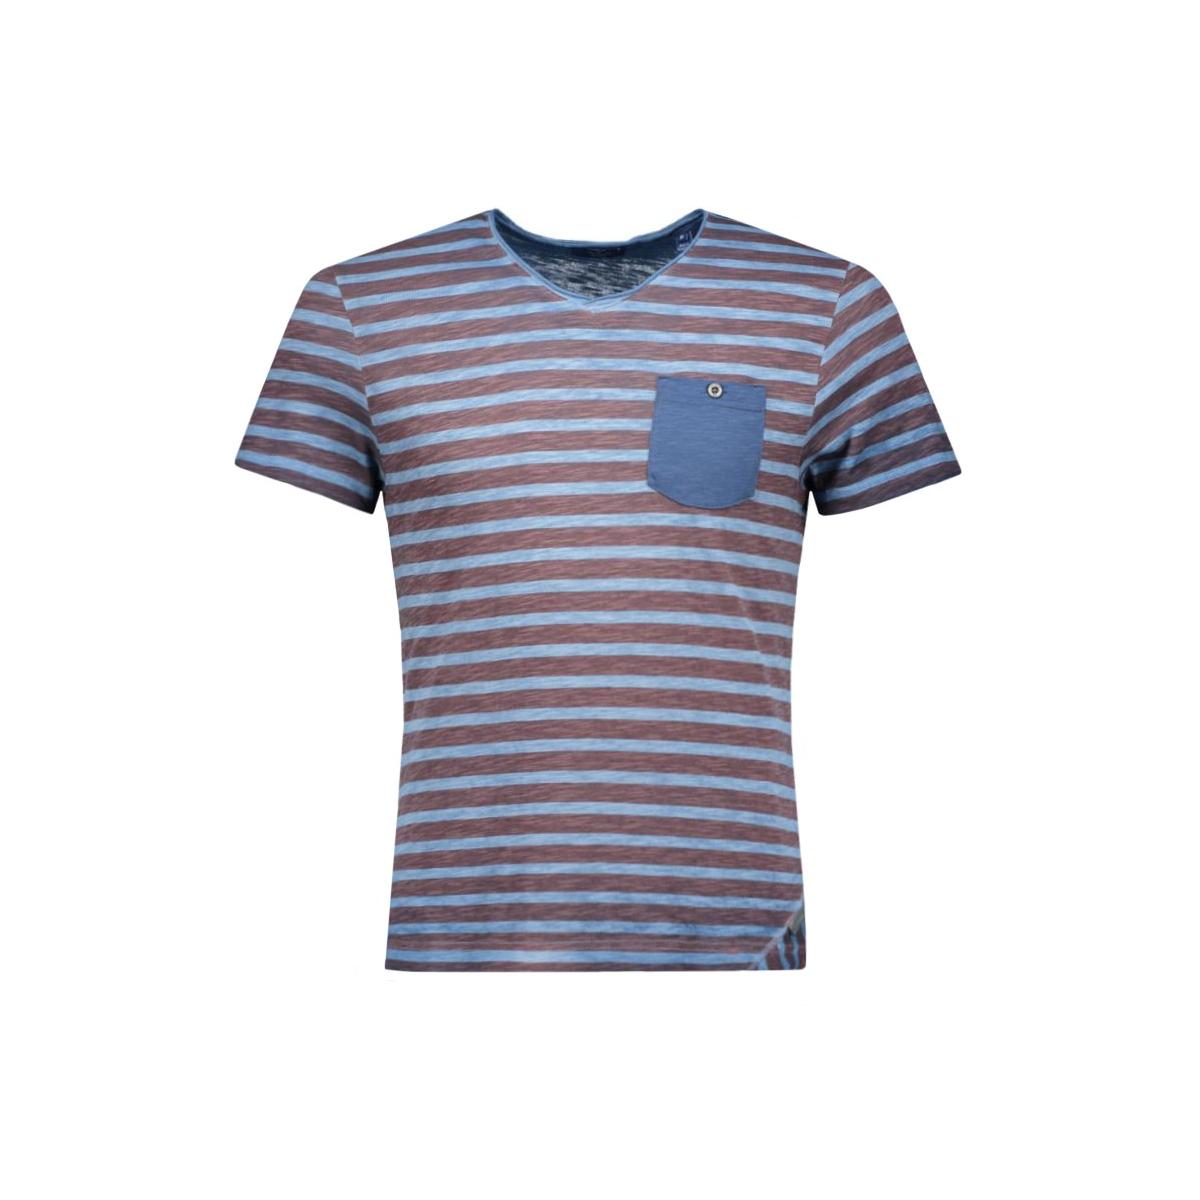 1035603.00.10 tom tailor t-shirt 6865